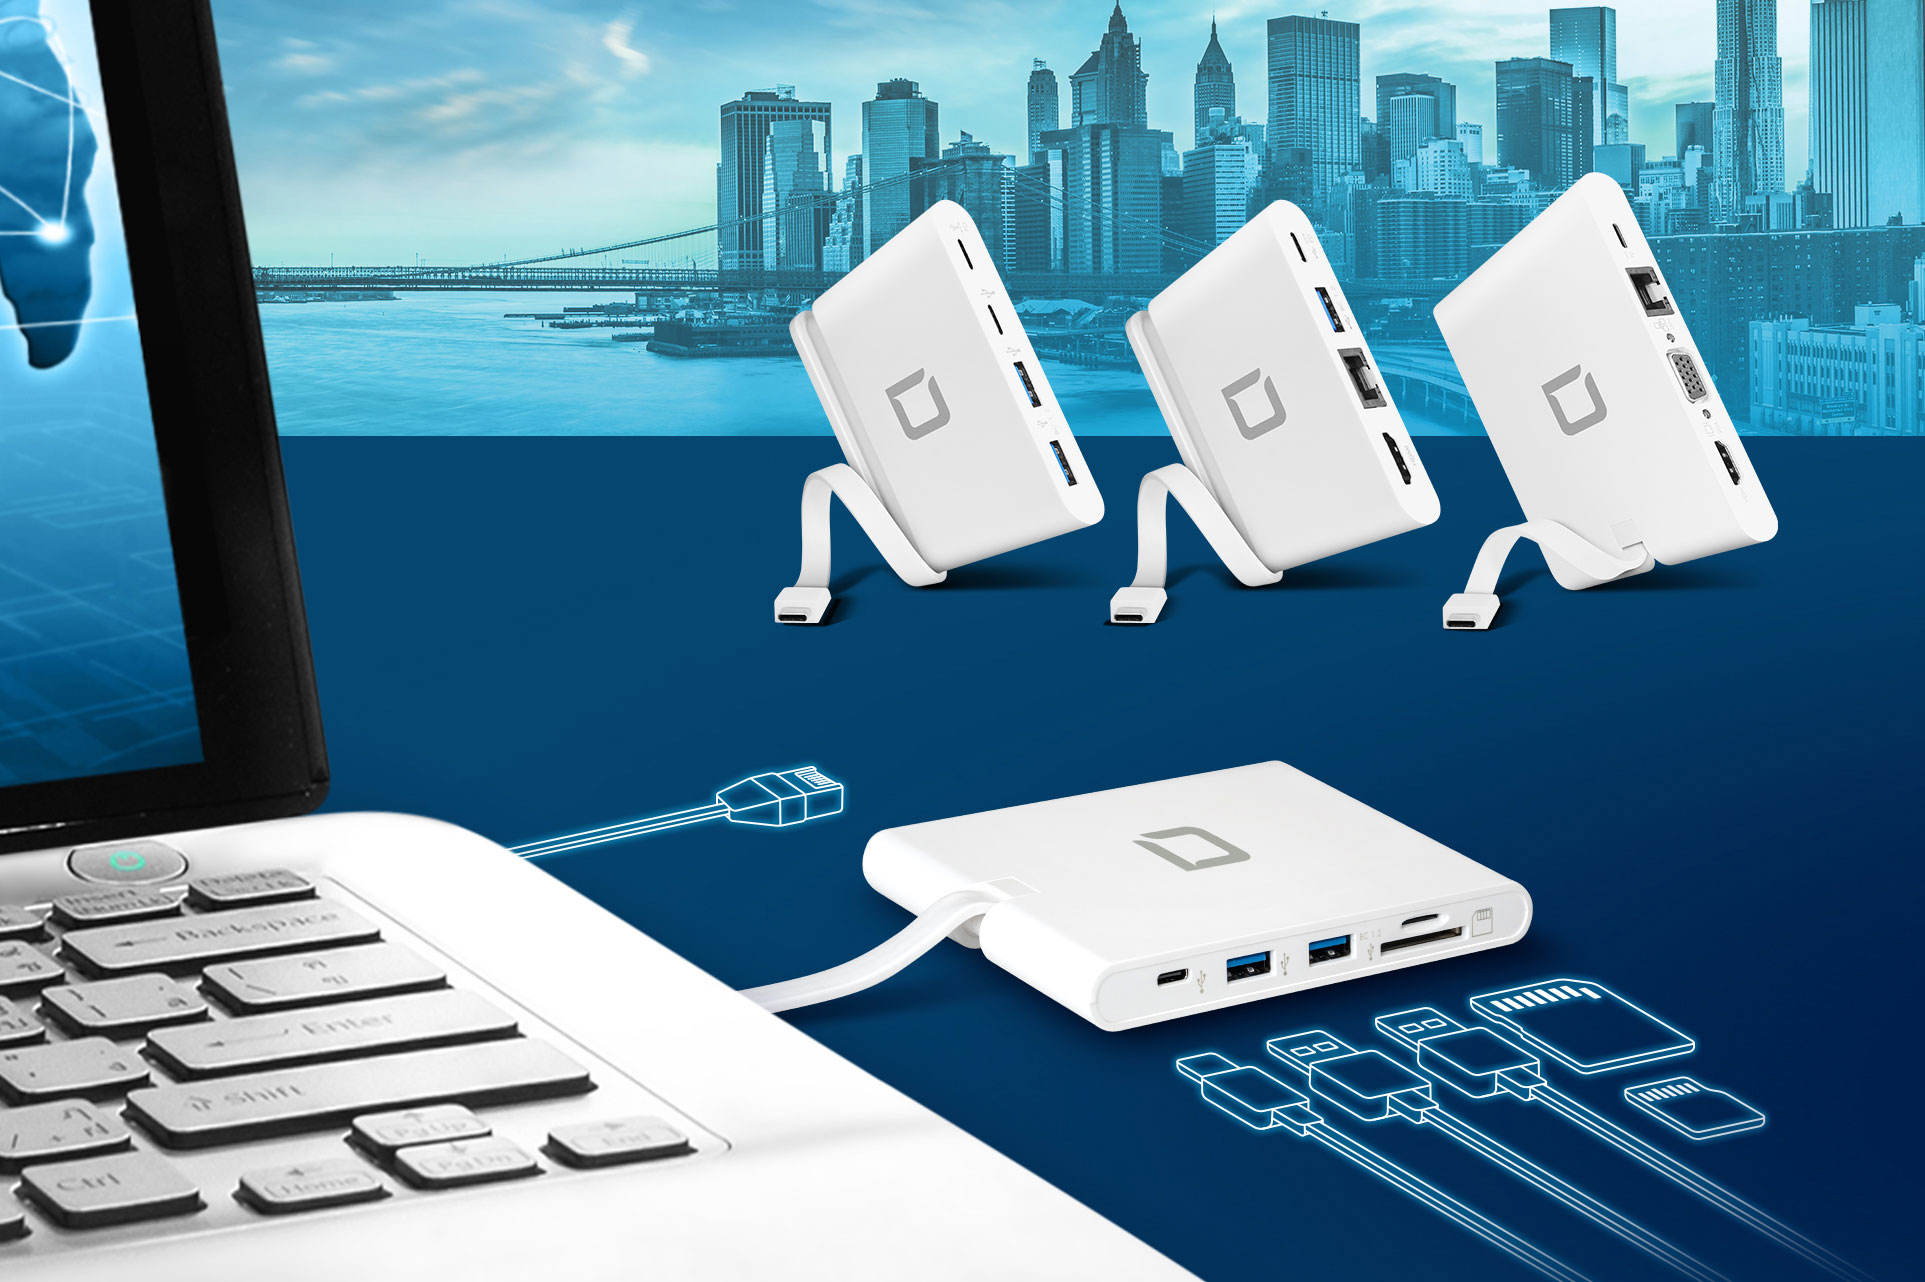 Versatile connectivity with a single USB-C port